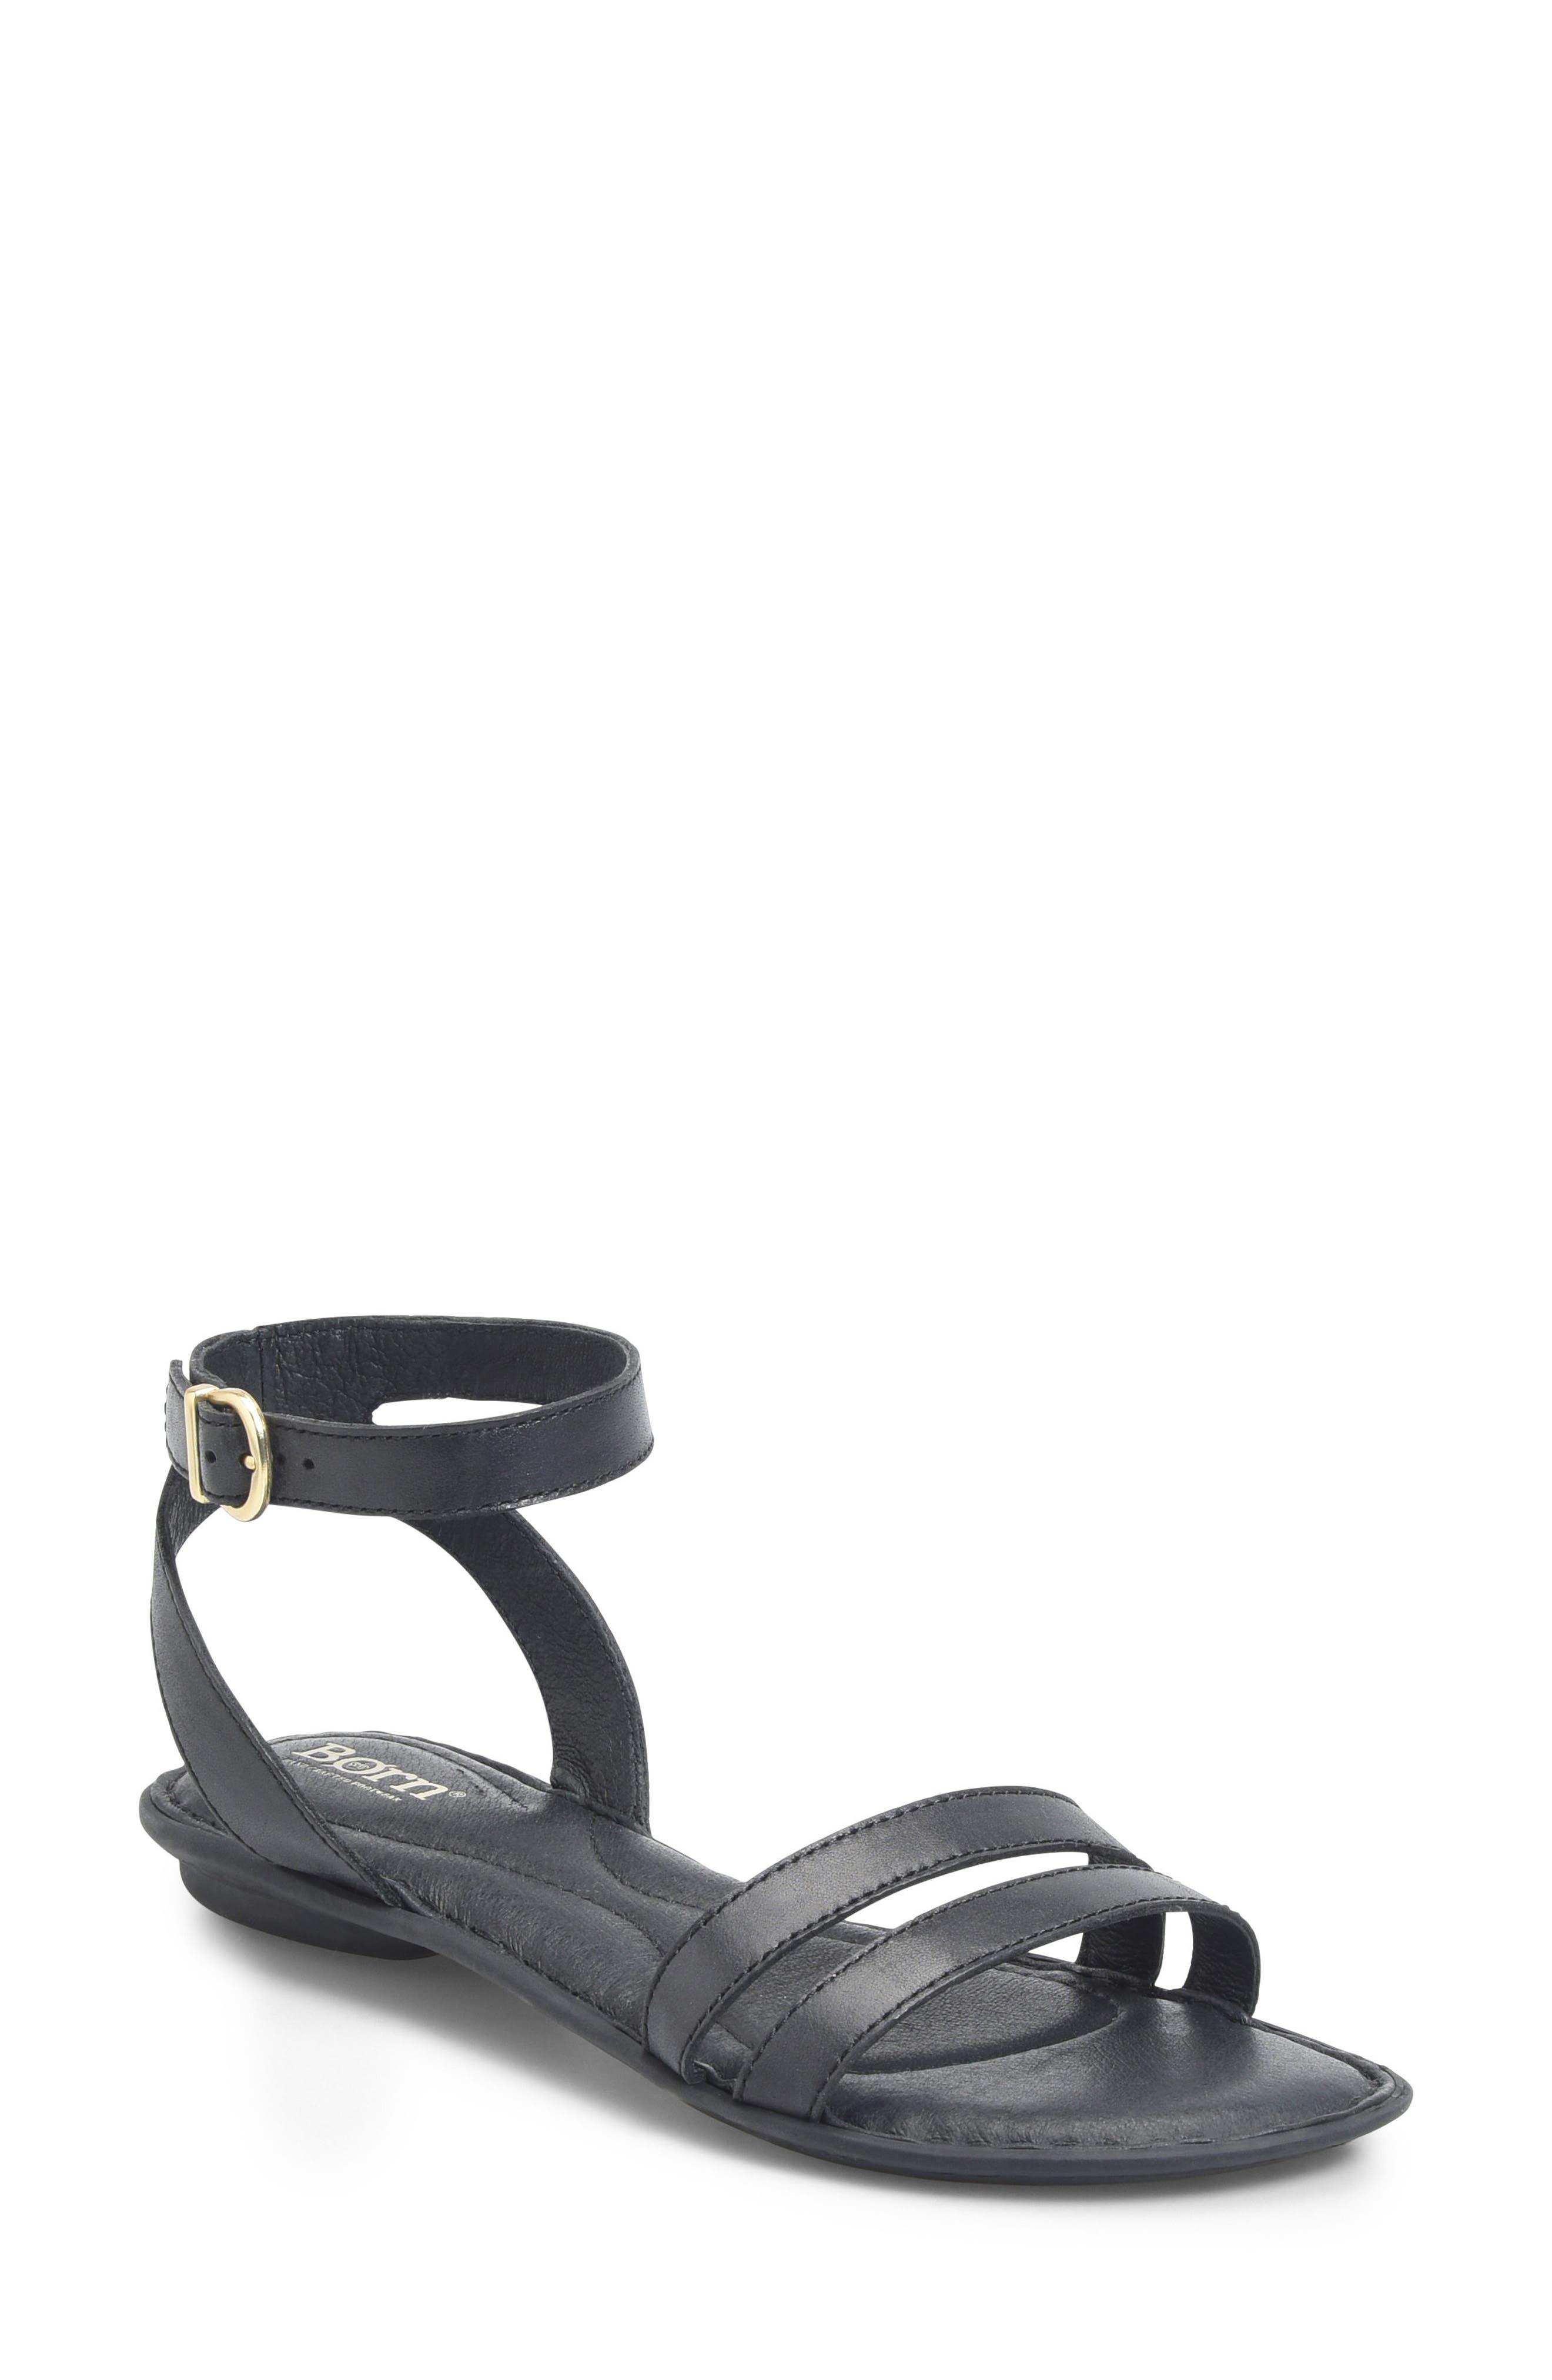 Mai Easy Sandal,                         Main,                         color, Black Leather